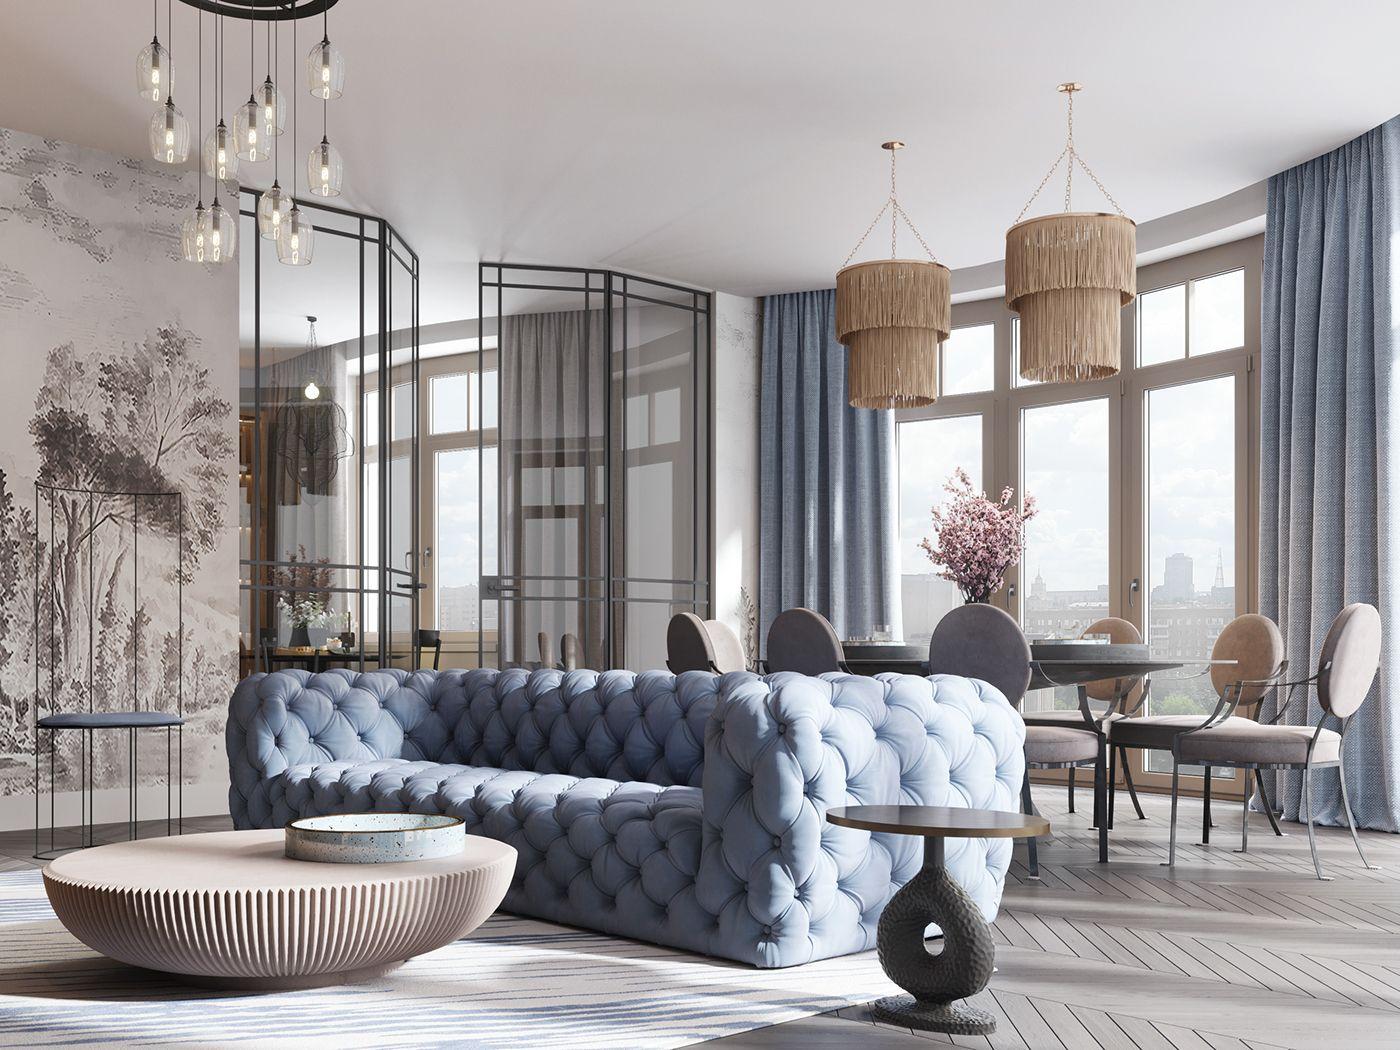 Apartments in Moscow.Design: Olesya Fedorenko (Home nature ...